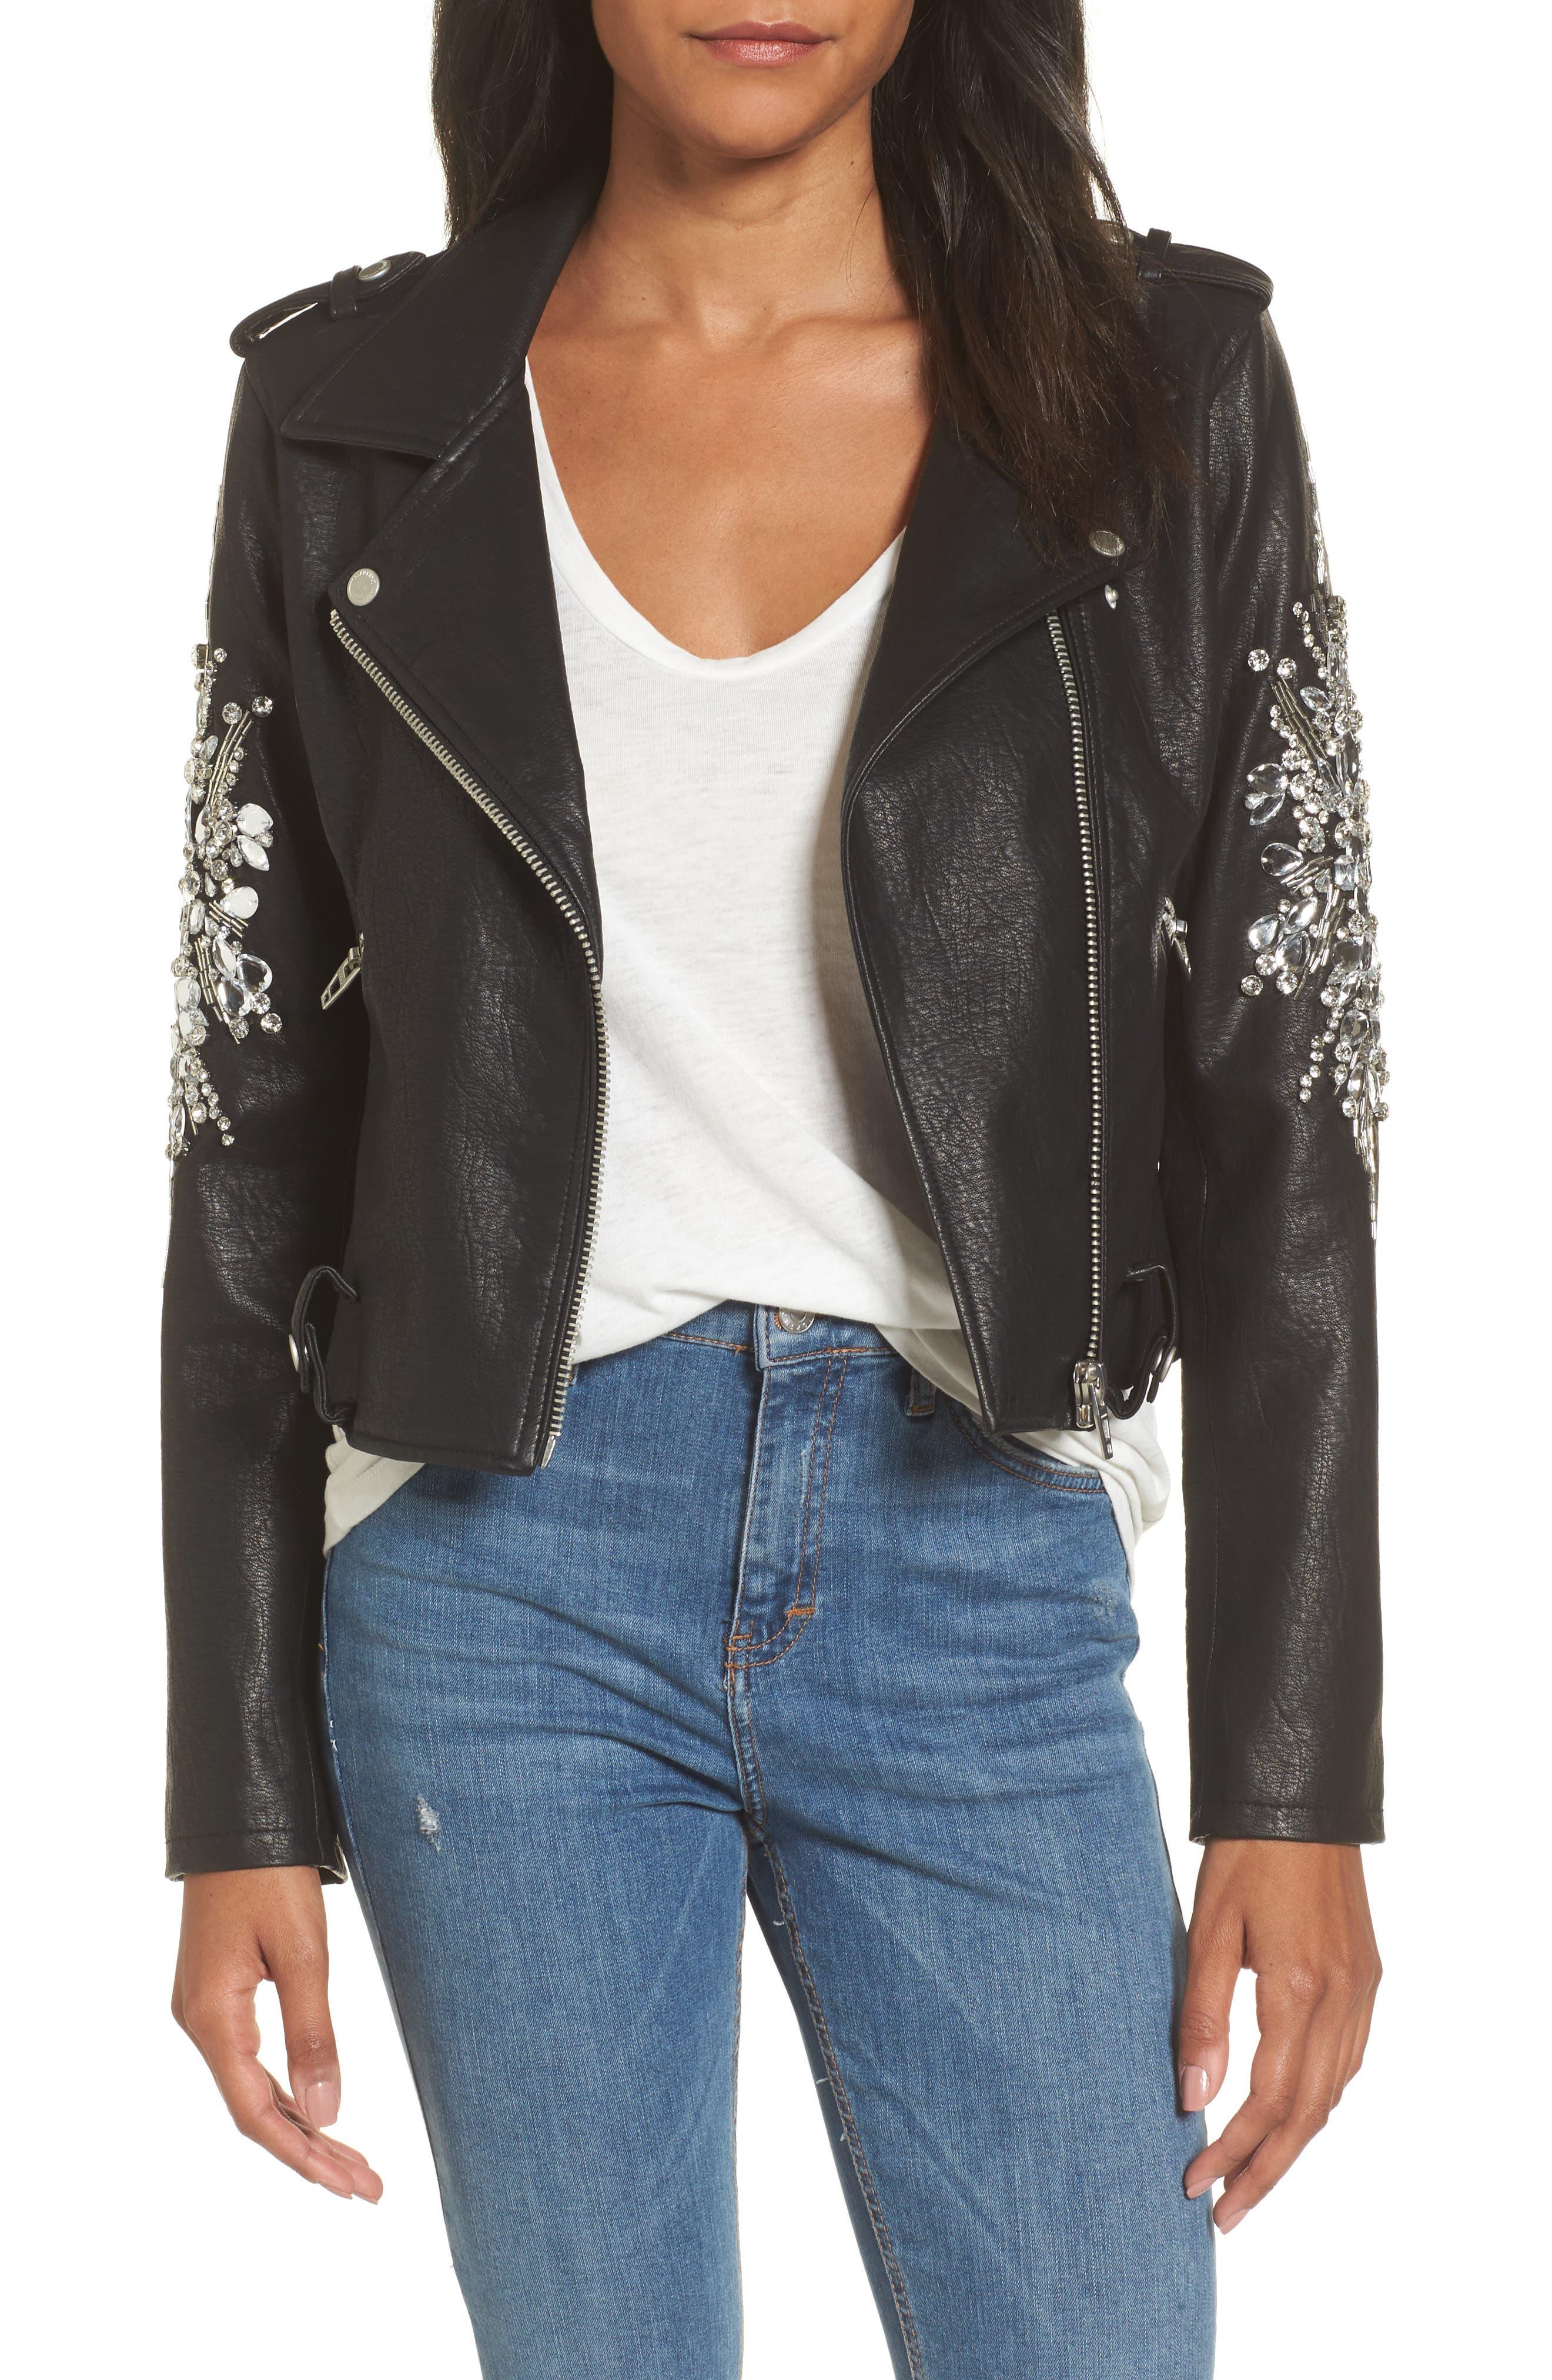 Alternate Image 1 Selected - BLANKNYC Embellished Faux Leather Moto Jacket